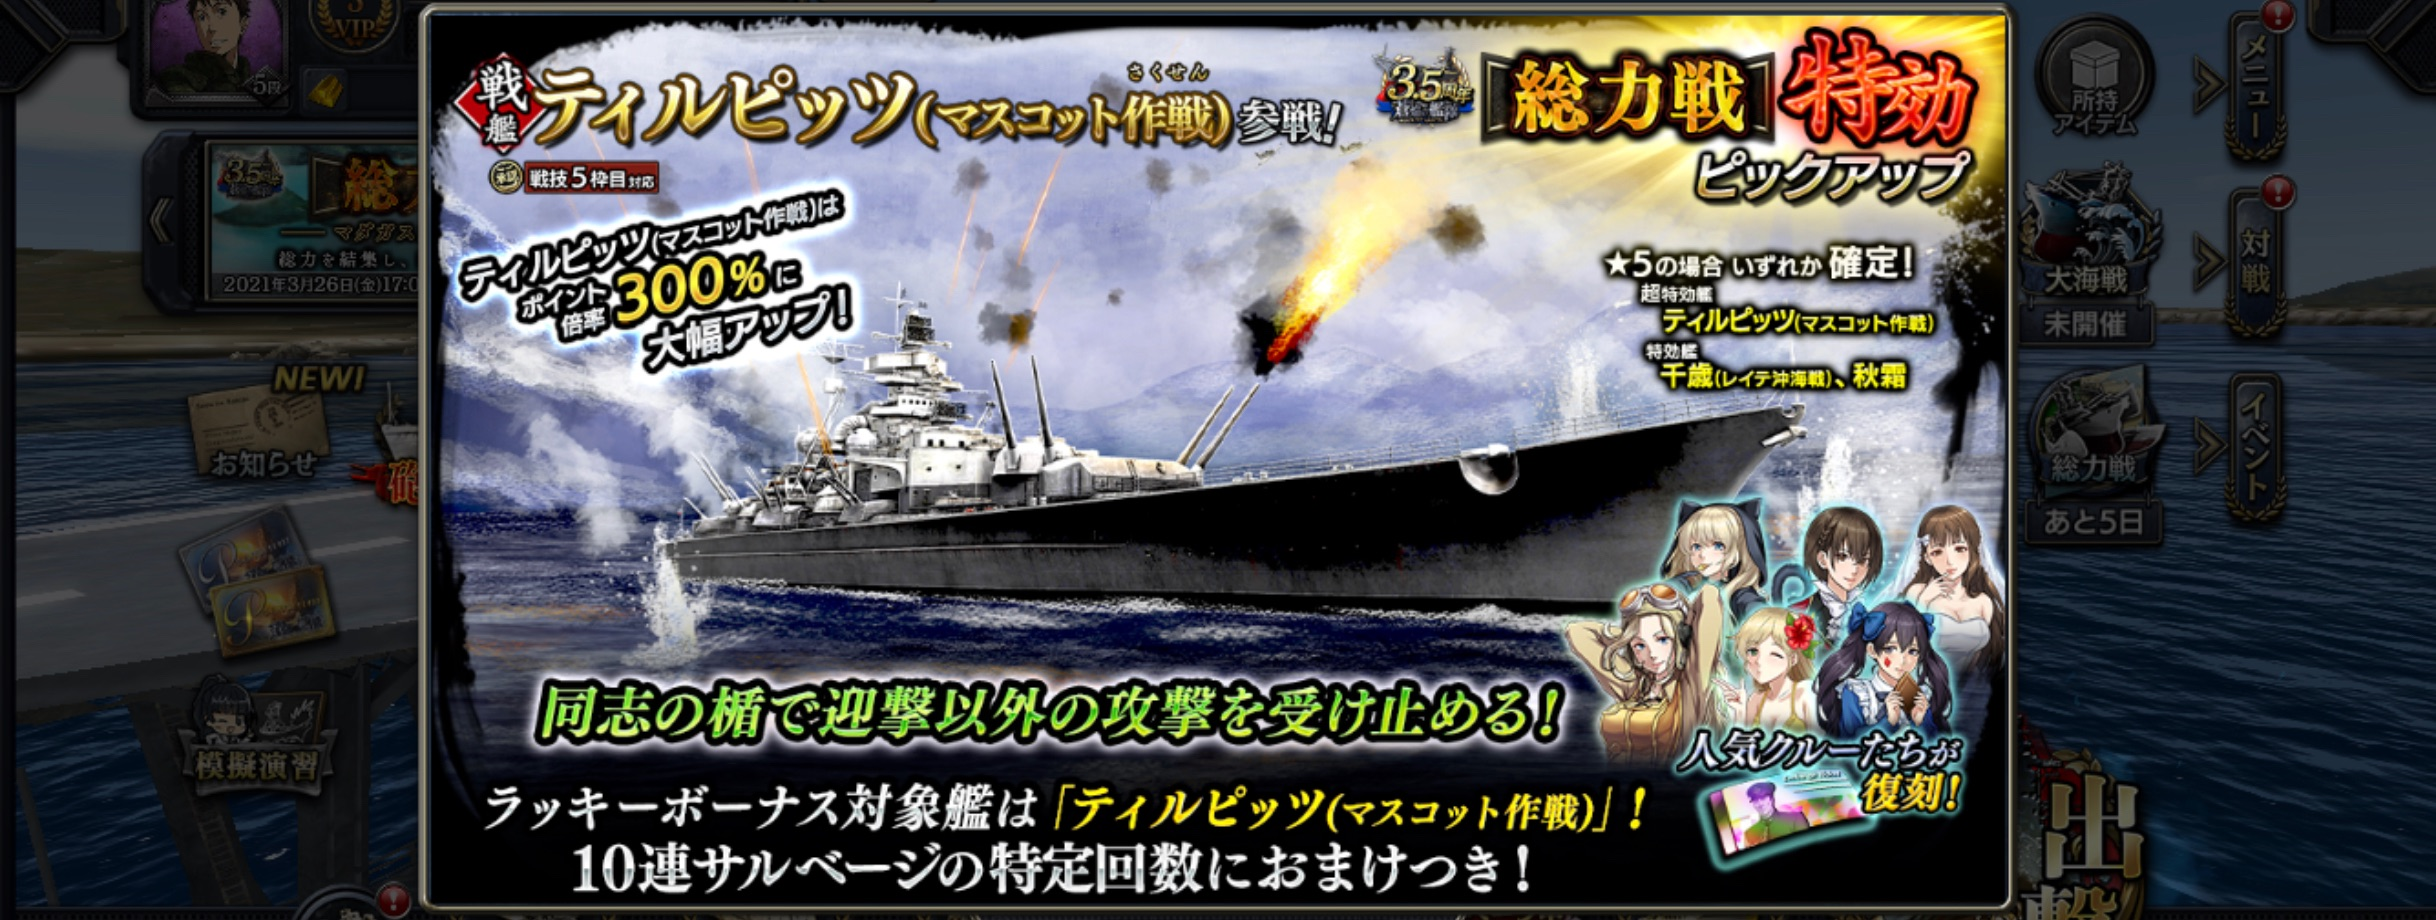 battleship-TirpitzM